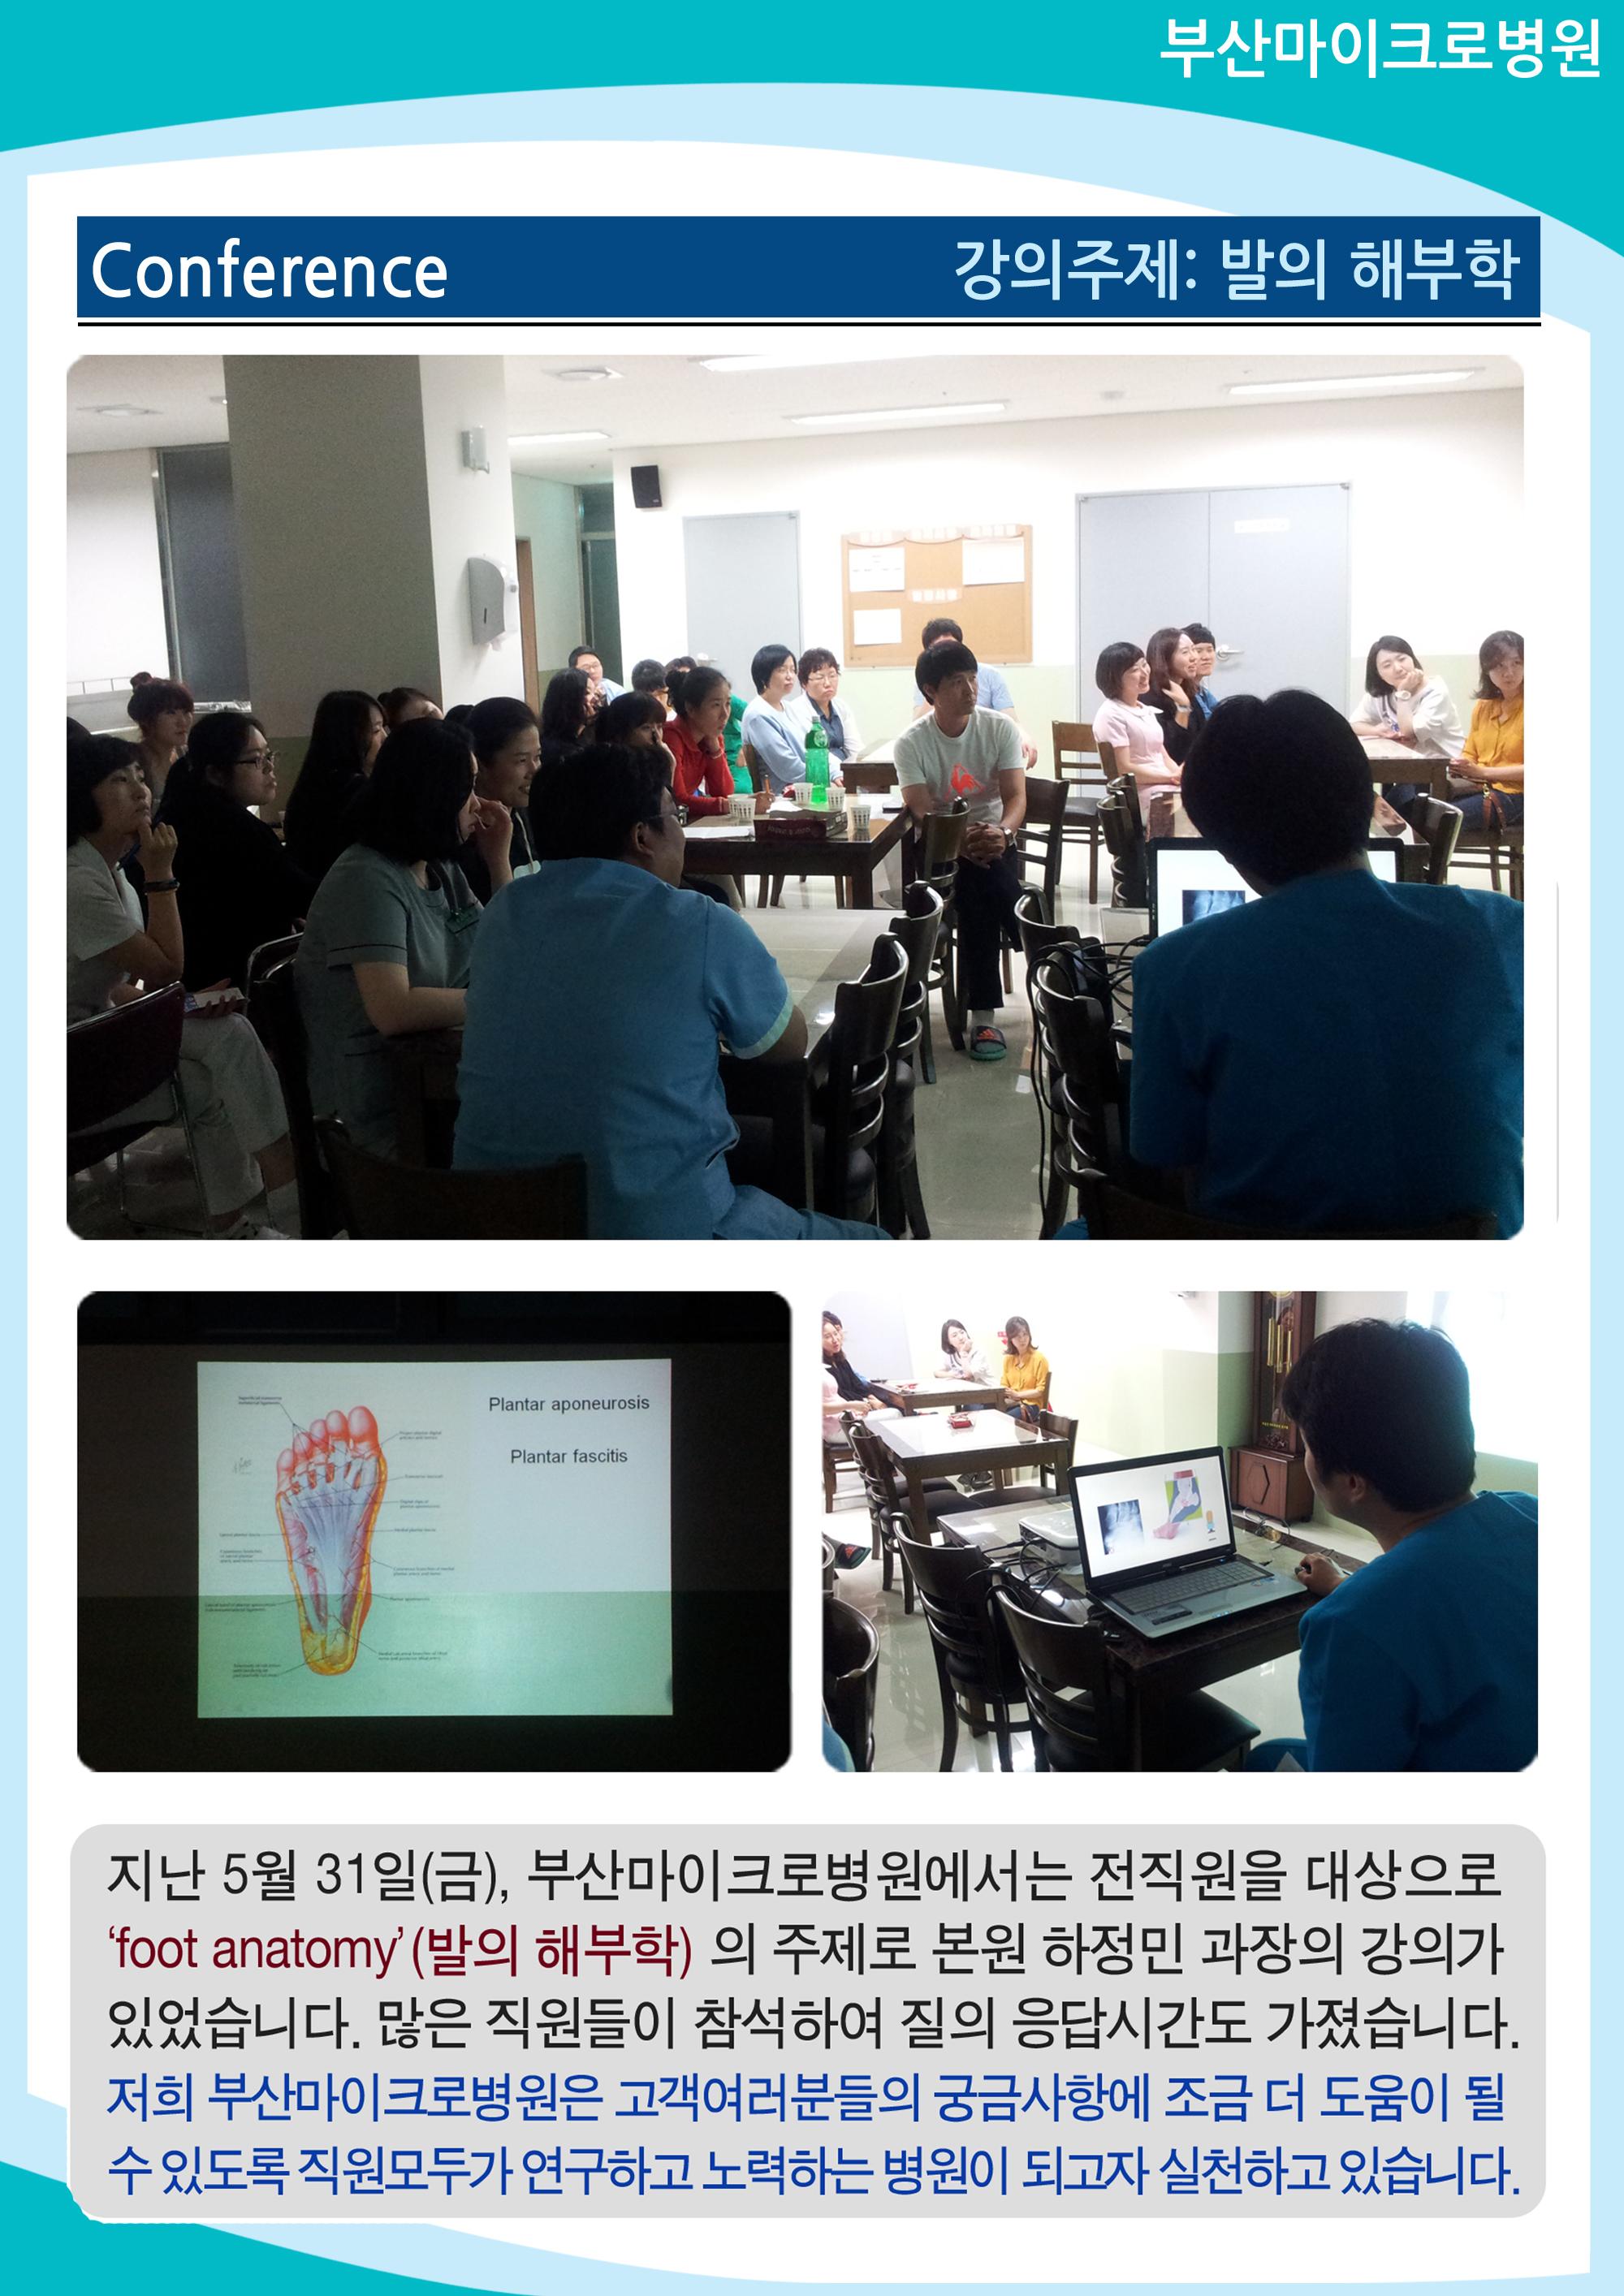 [2013.05] Conference - 발의 해부학